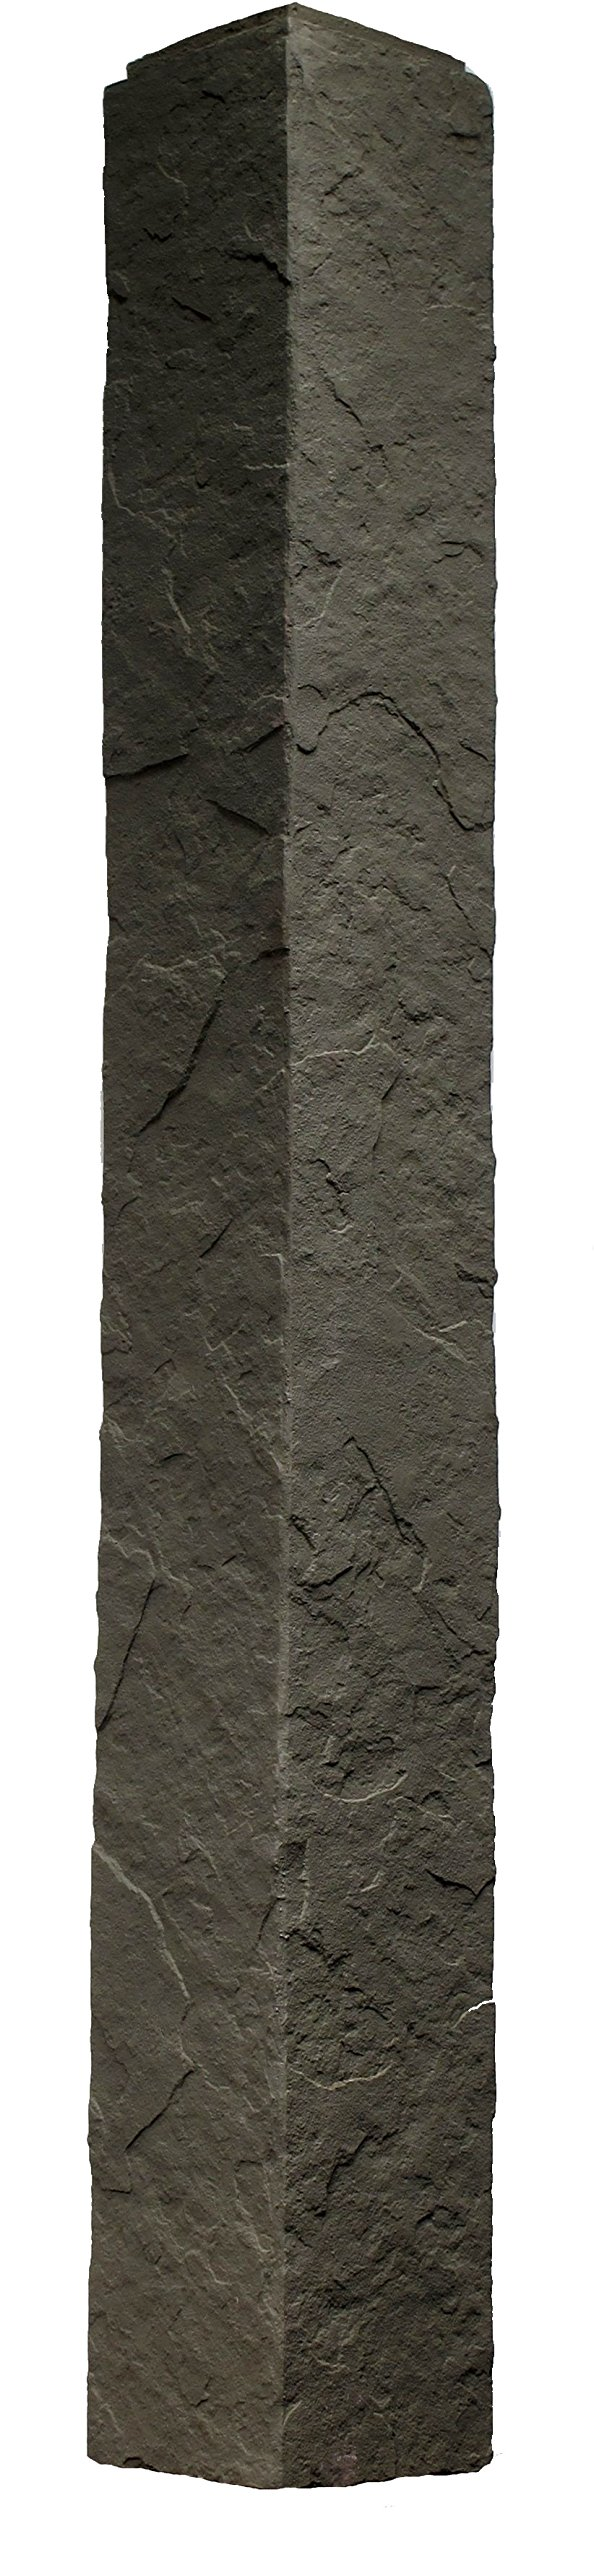 NextStone 5 1/2'' x 5 1/2'' x 48'' Sandstone Outside Corner Gray